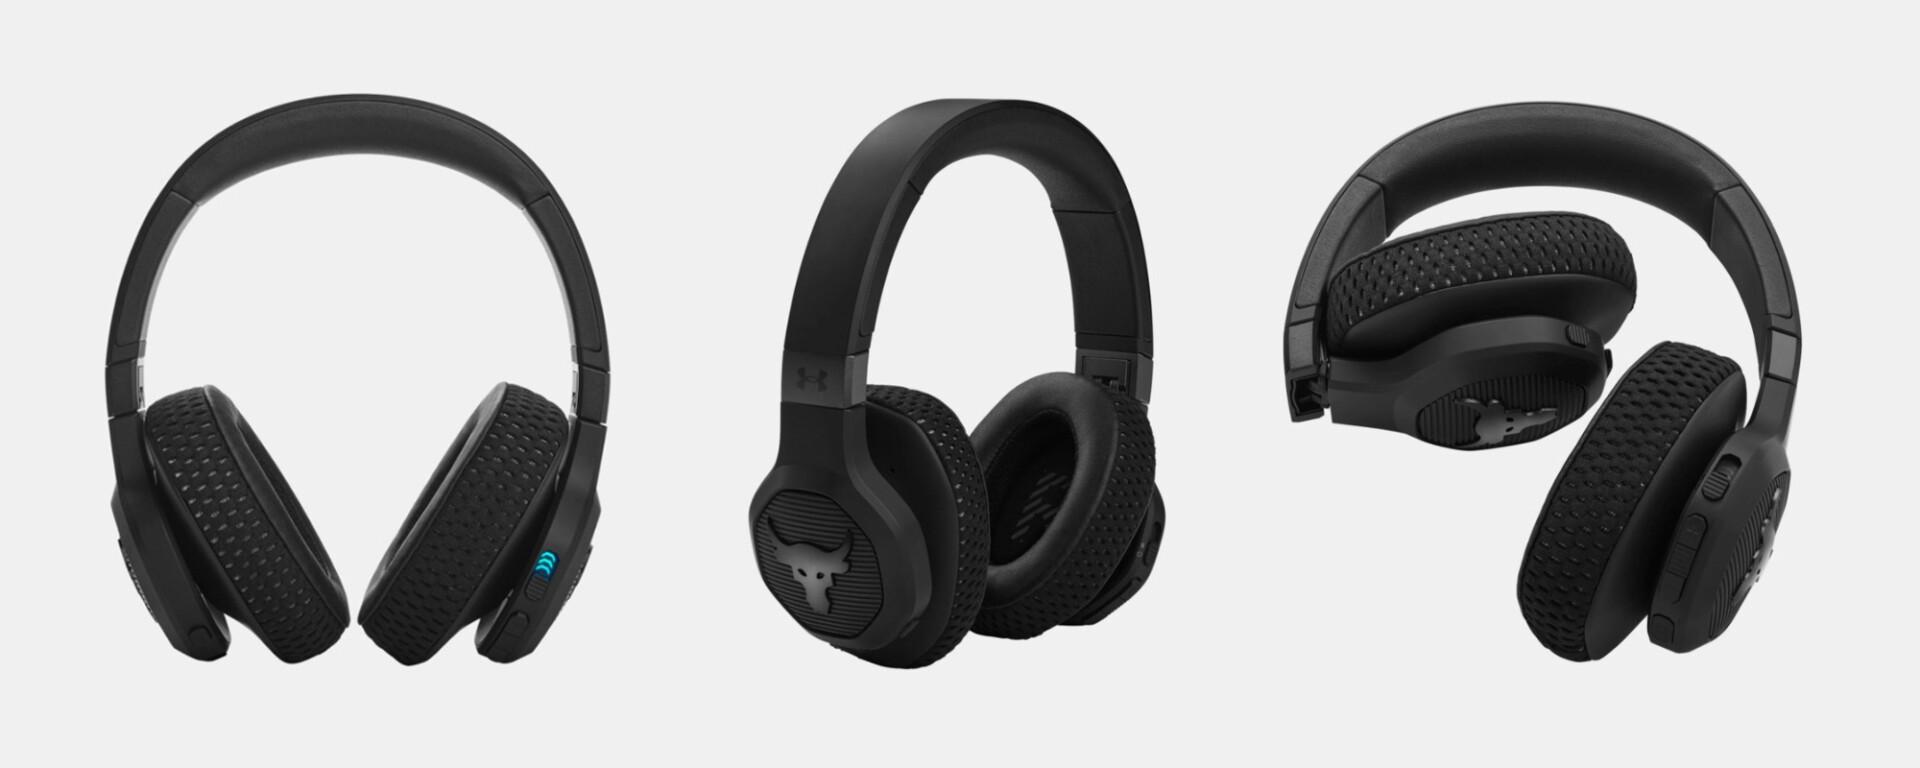 Under Armour Project Rock Headphones JBL